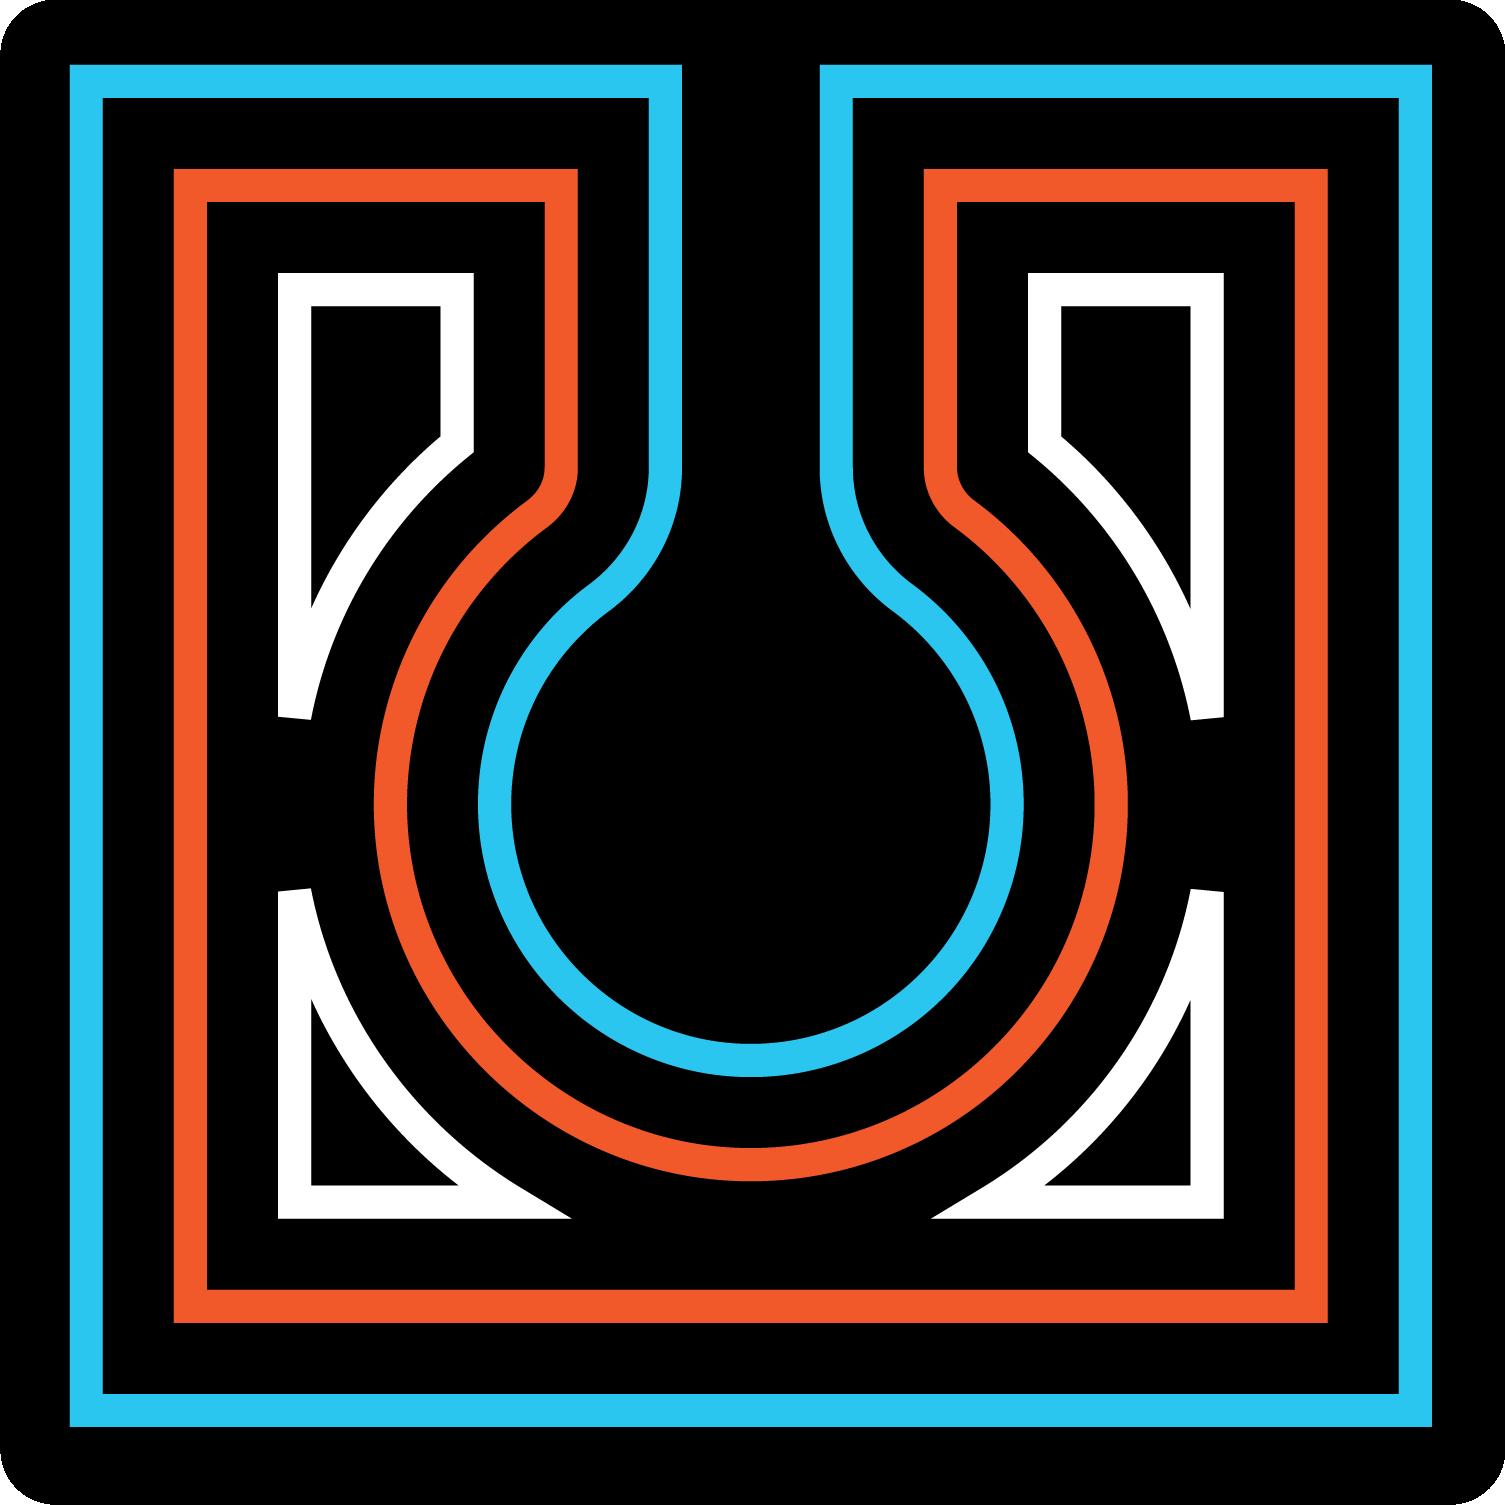 tinderbox-games-lab-logo-icon-1-1